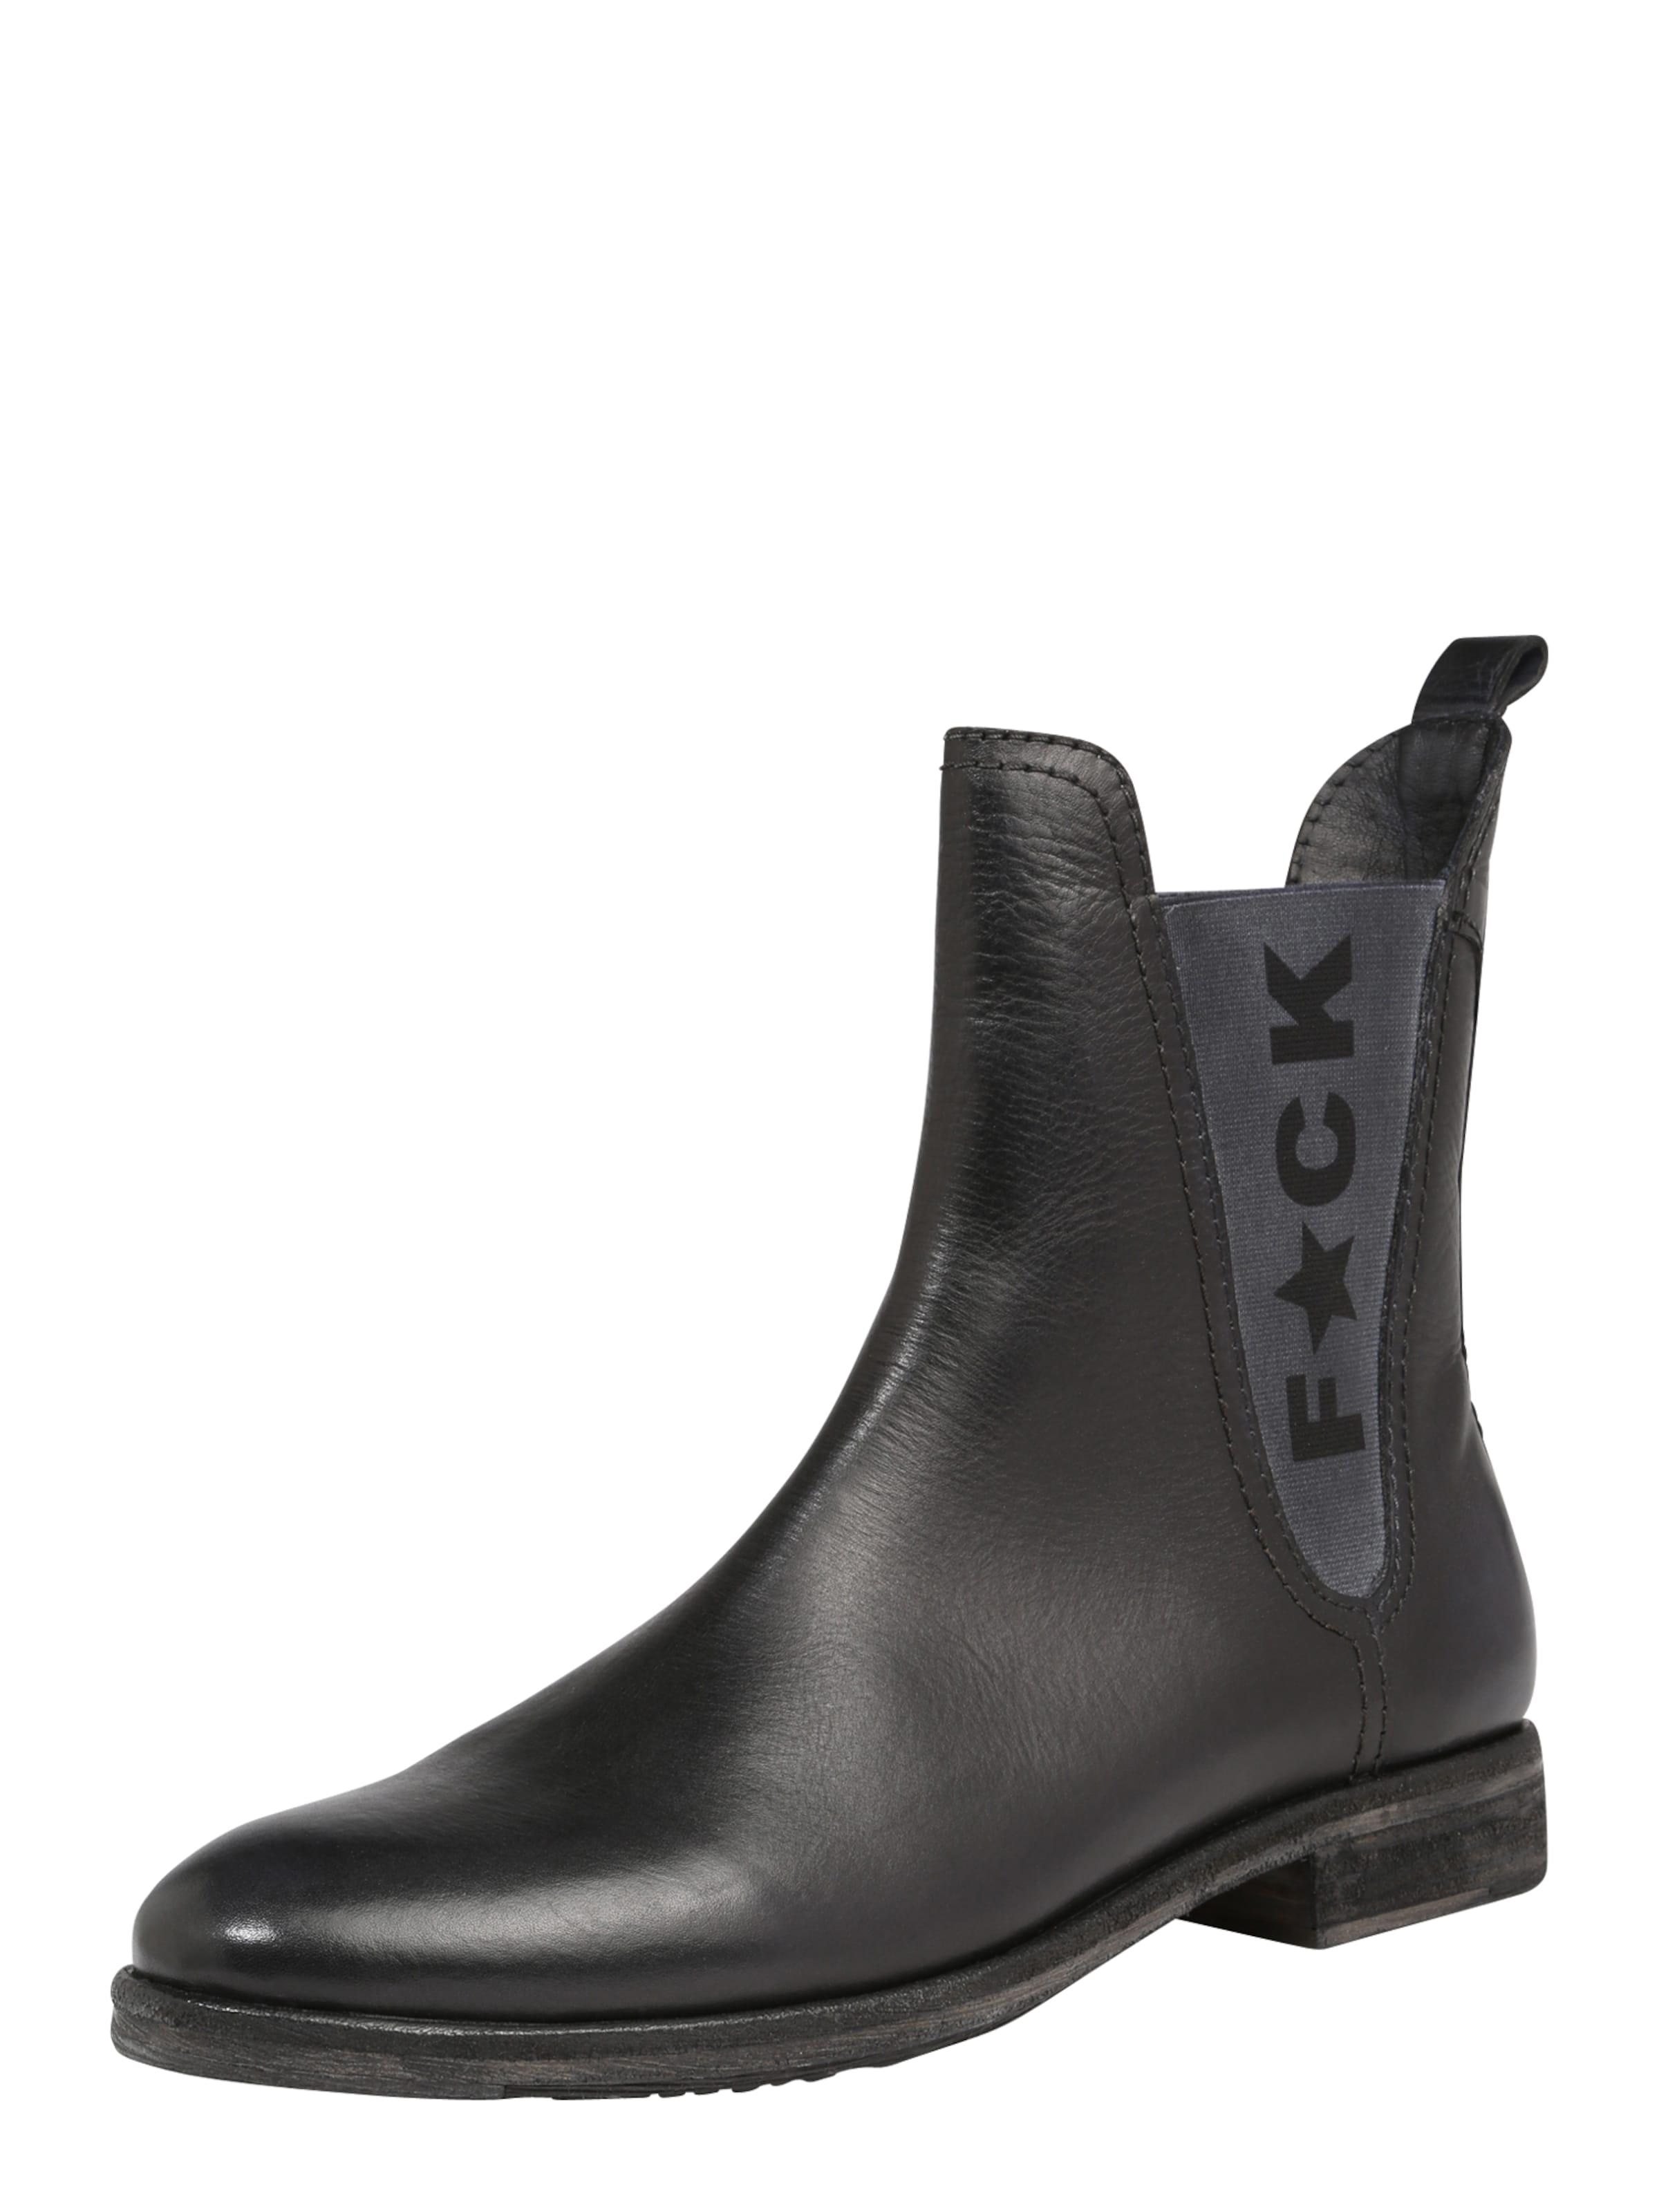 THOMAS HAYO for CRICKIT   Chelsea 'Tom' Schuhe Gut getragene Schuhe